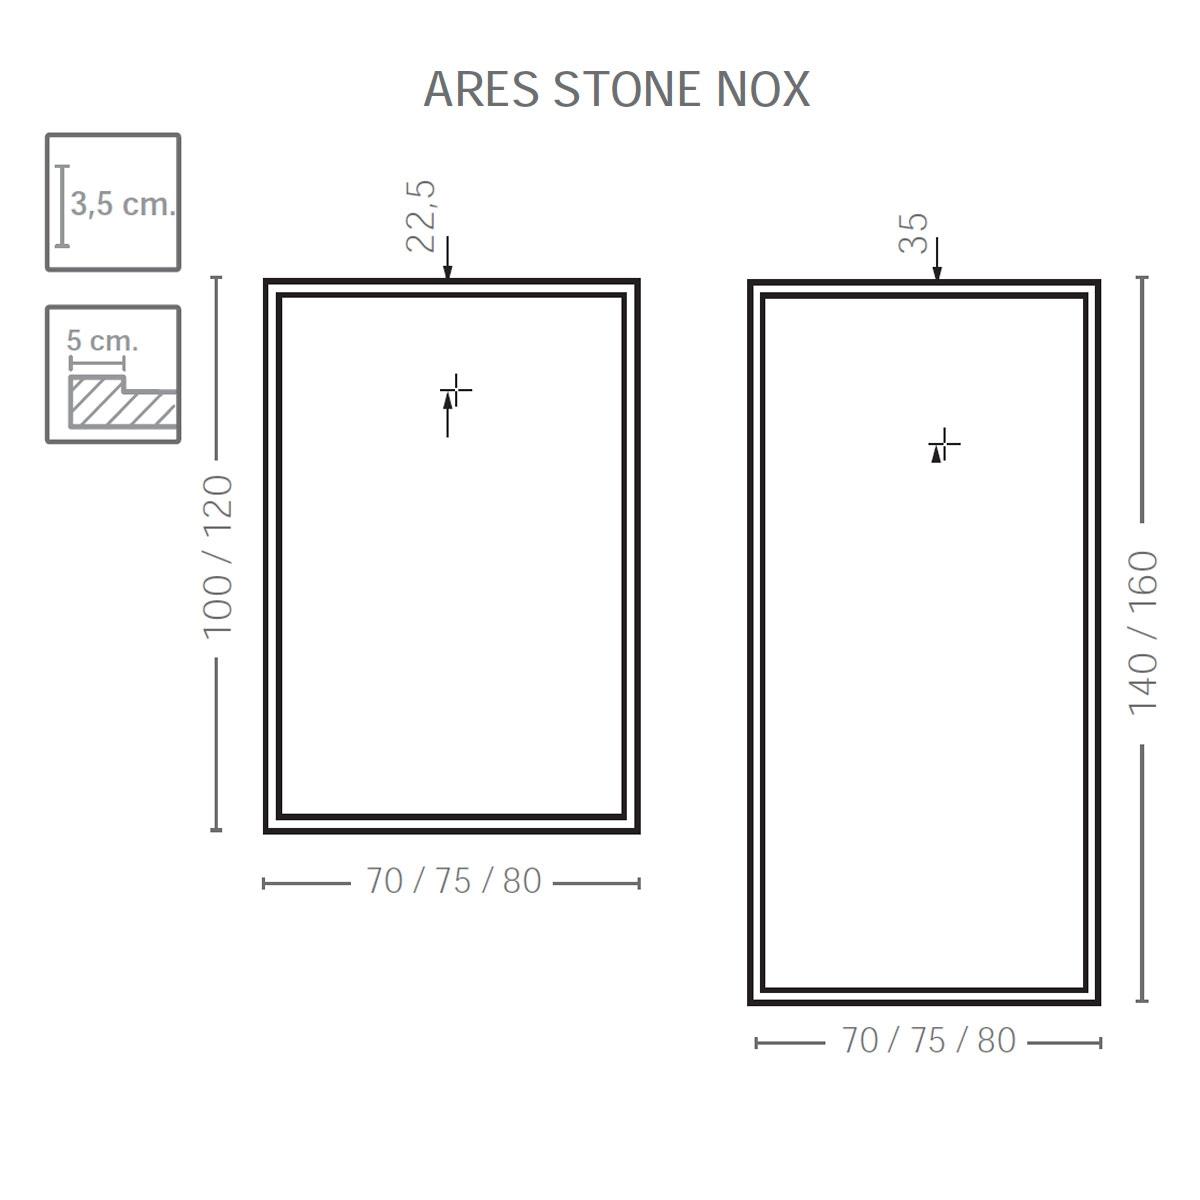 Plato de ducha rectangular 120x80 Ares Stone Nox Perla